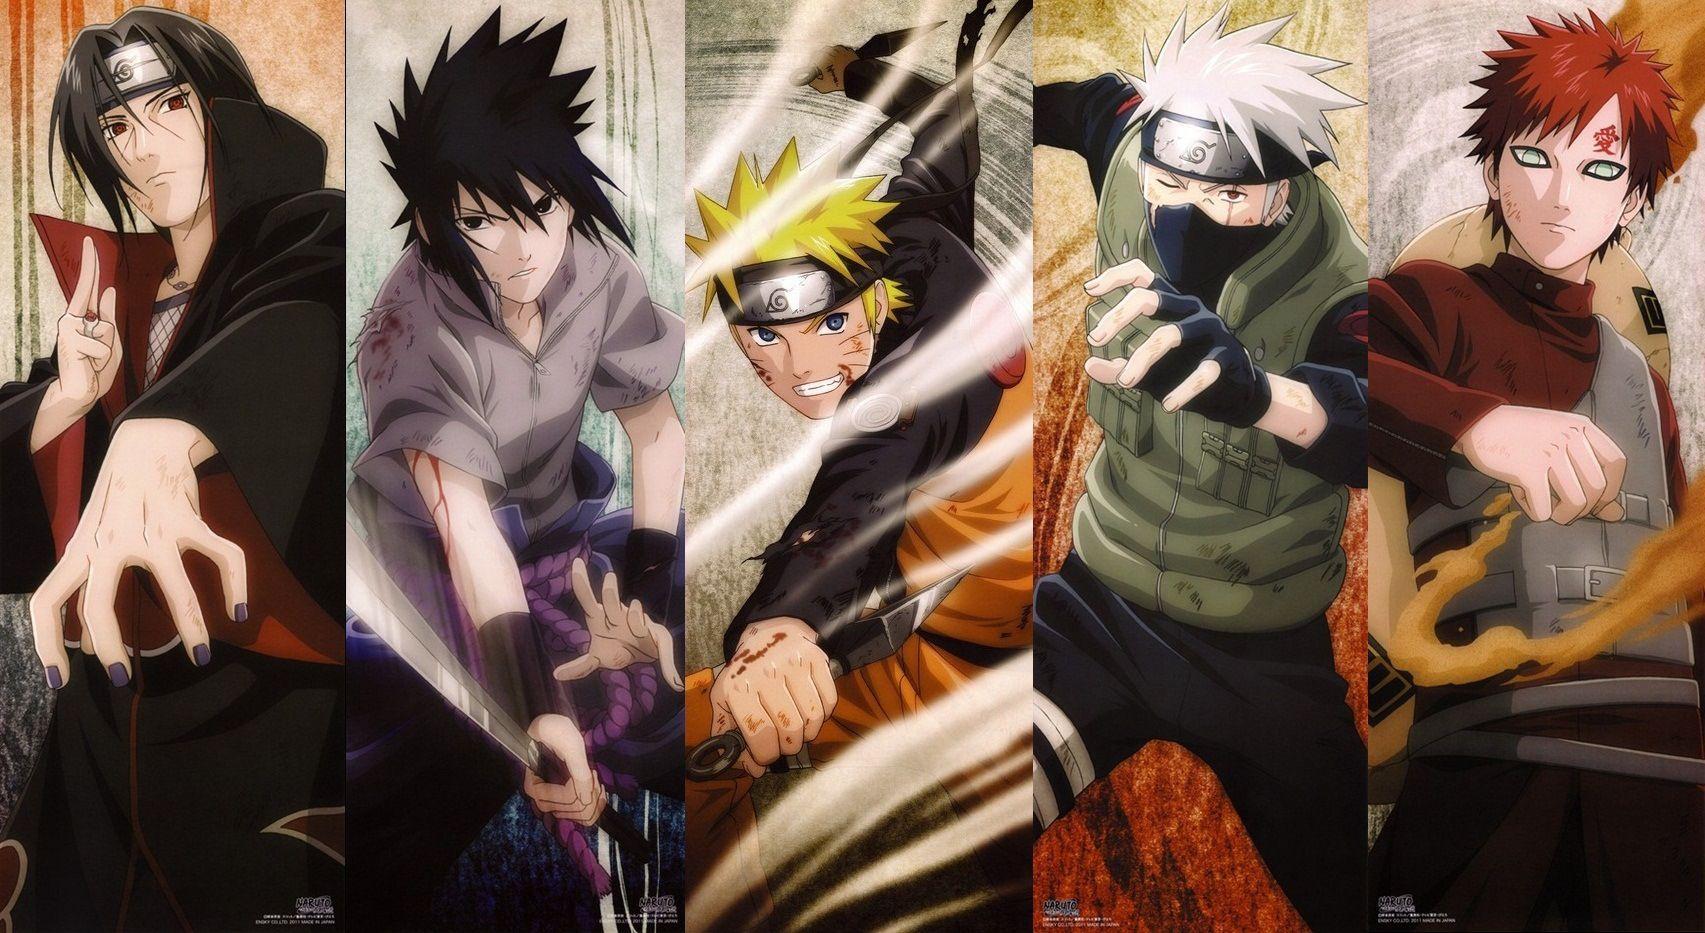 Naruto and company www.tokyomask.com